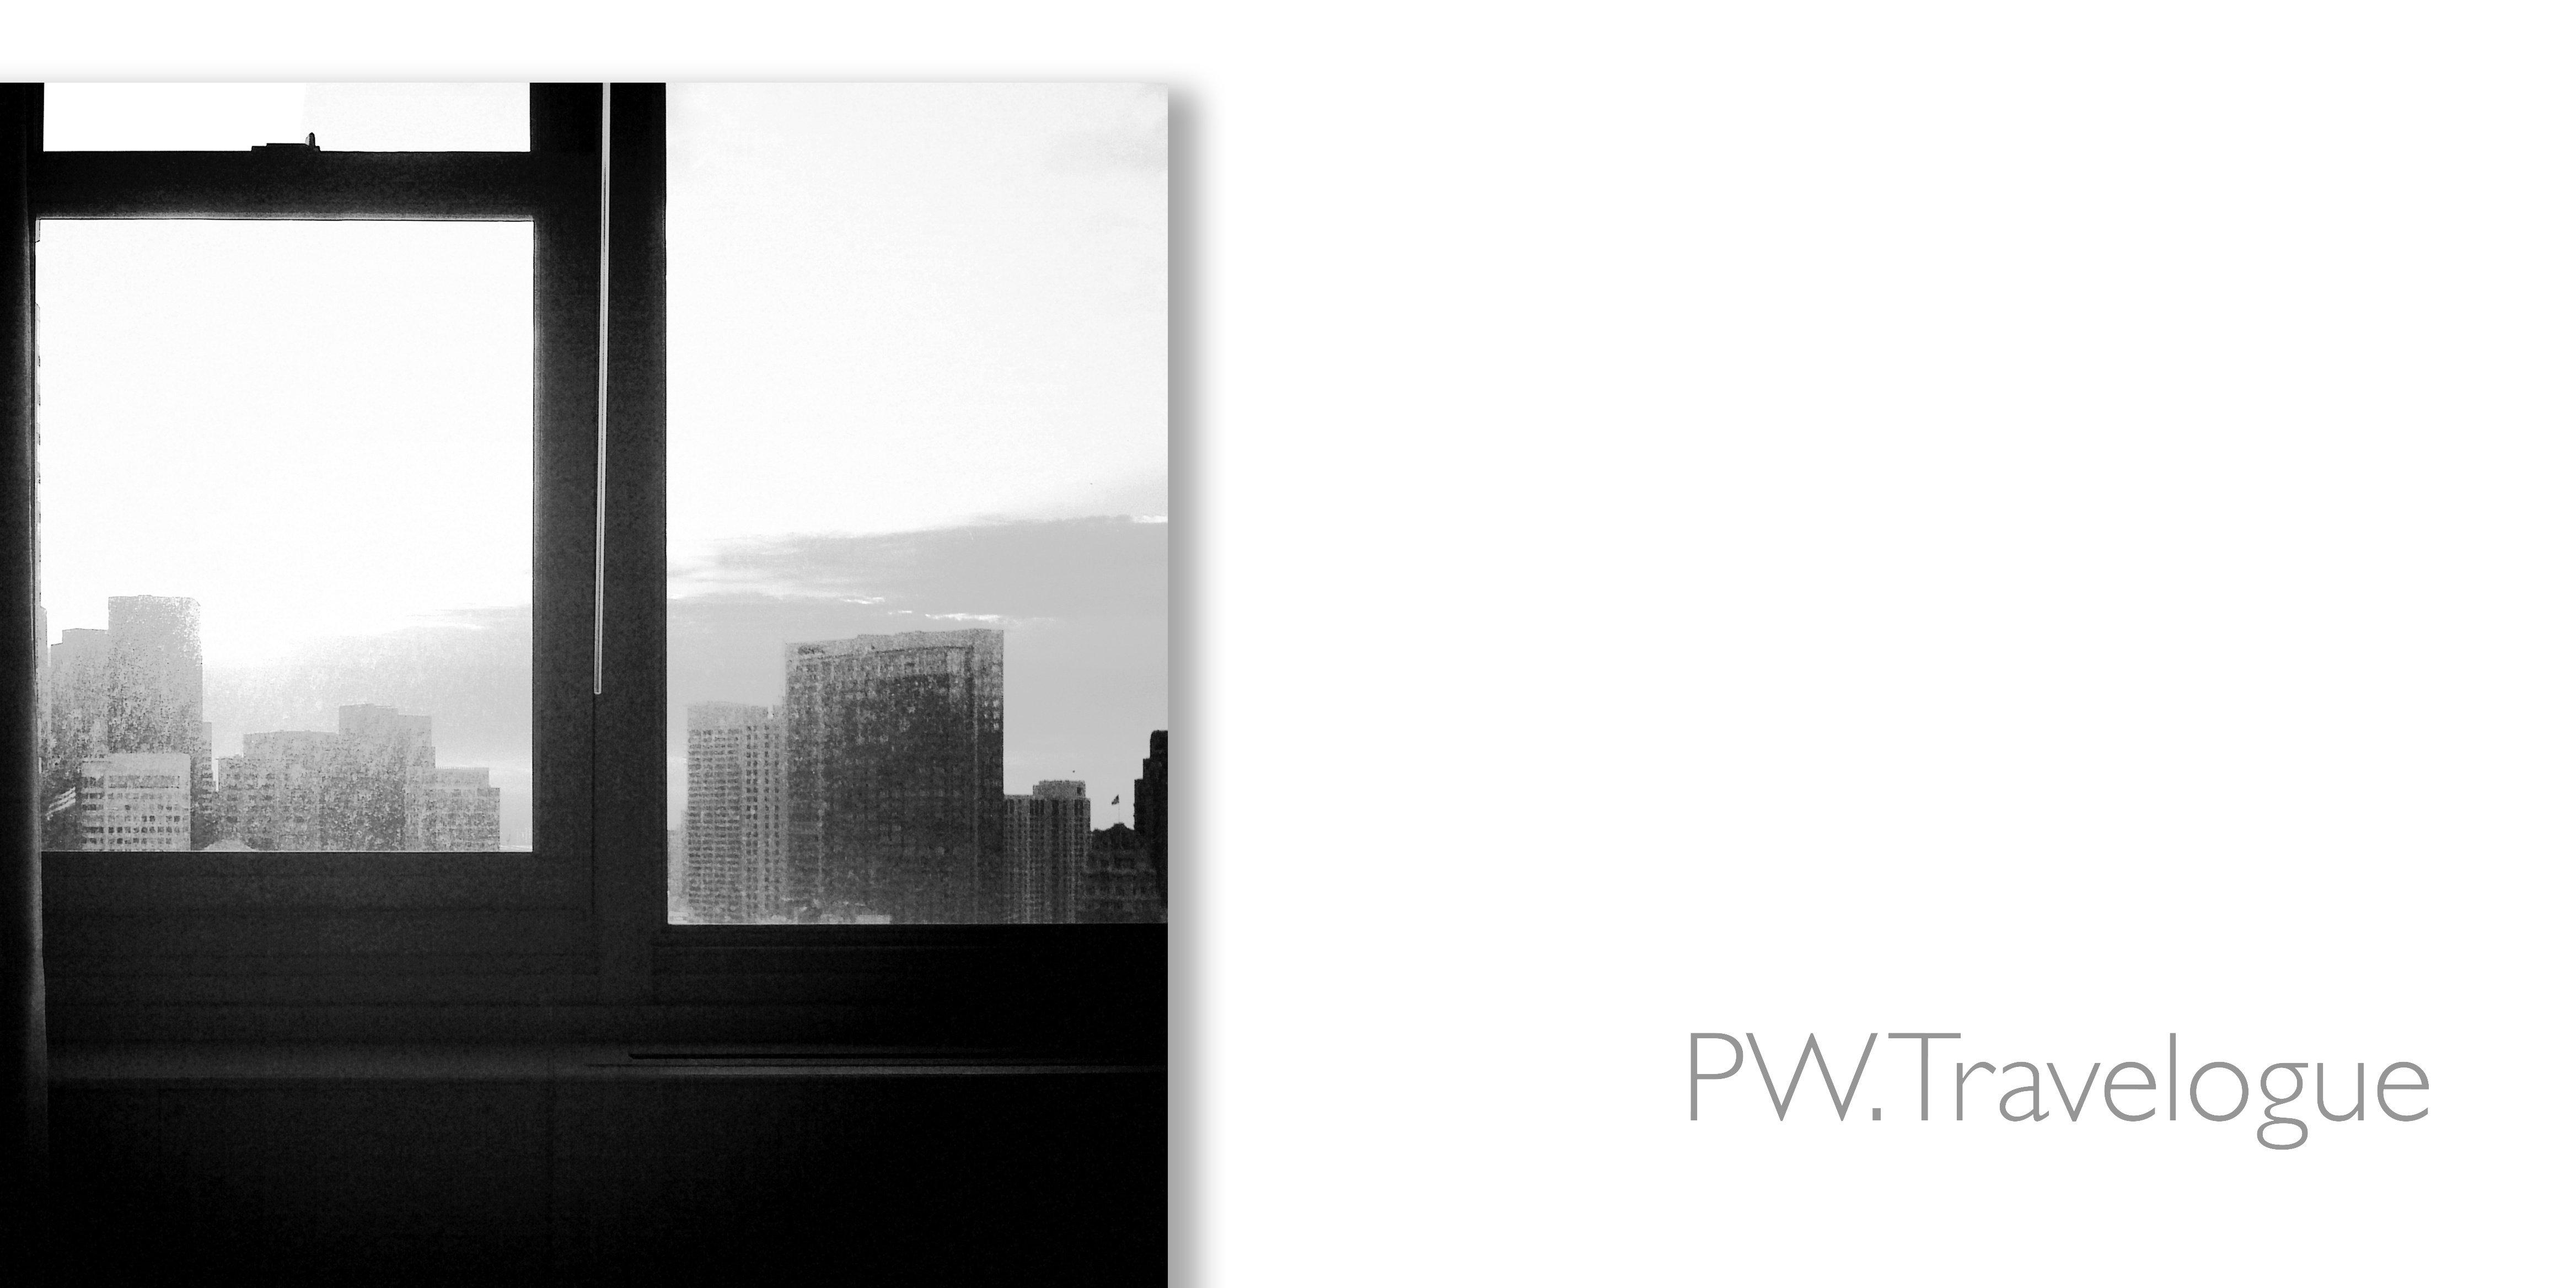 PWTravelogue_Header.jpg